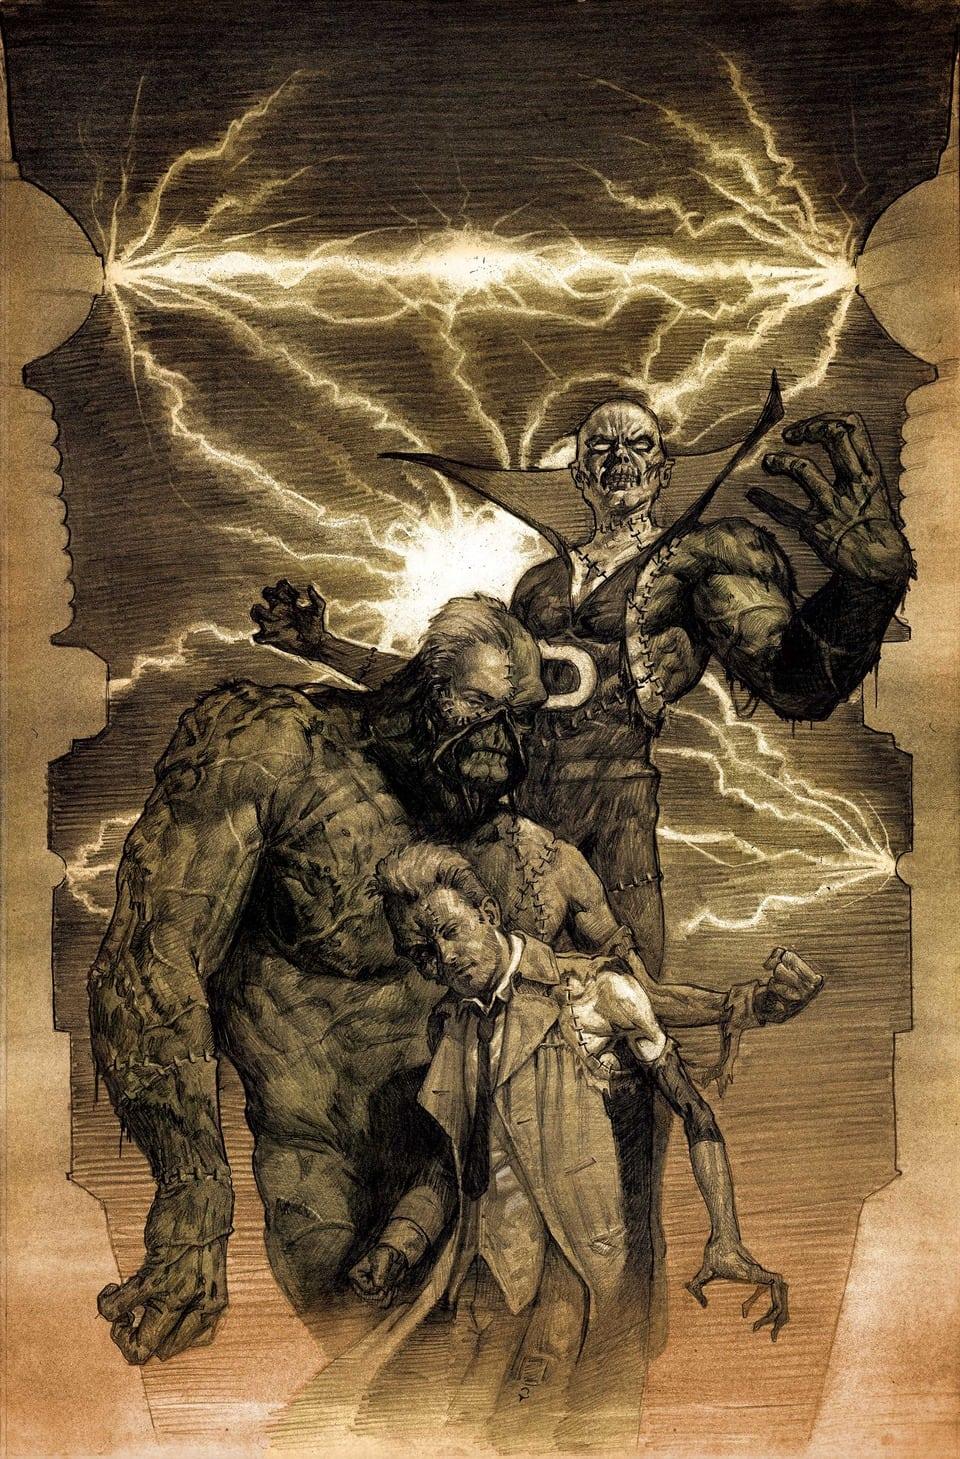 Justice League Dark #35